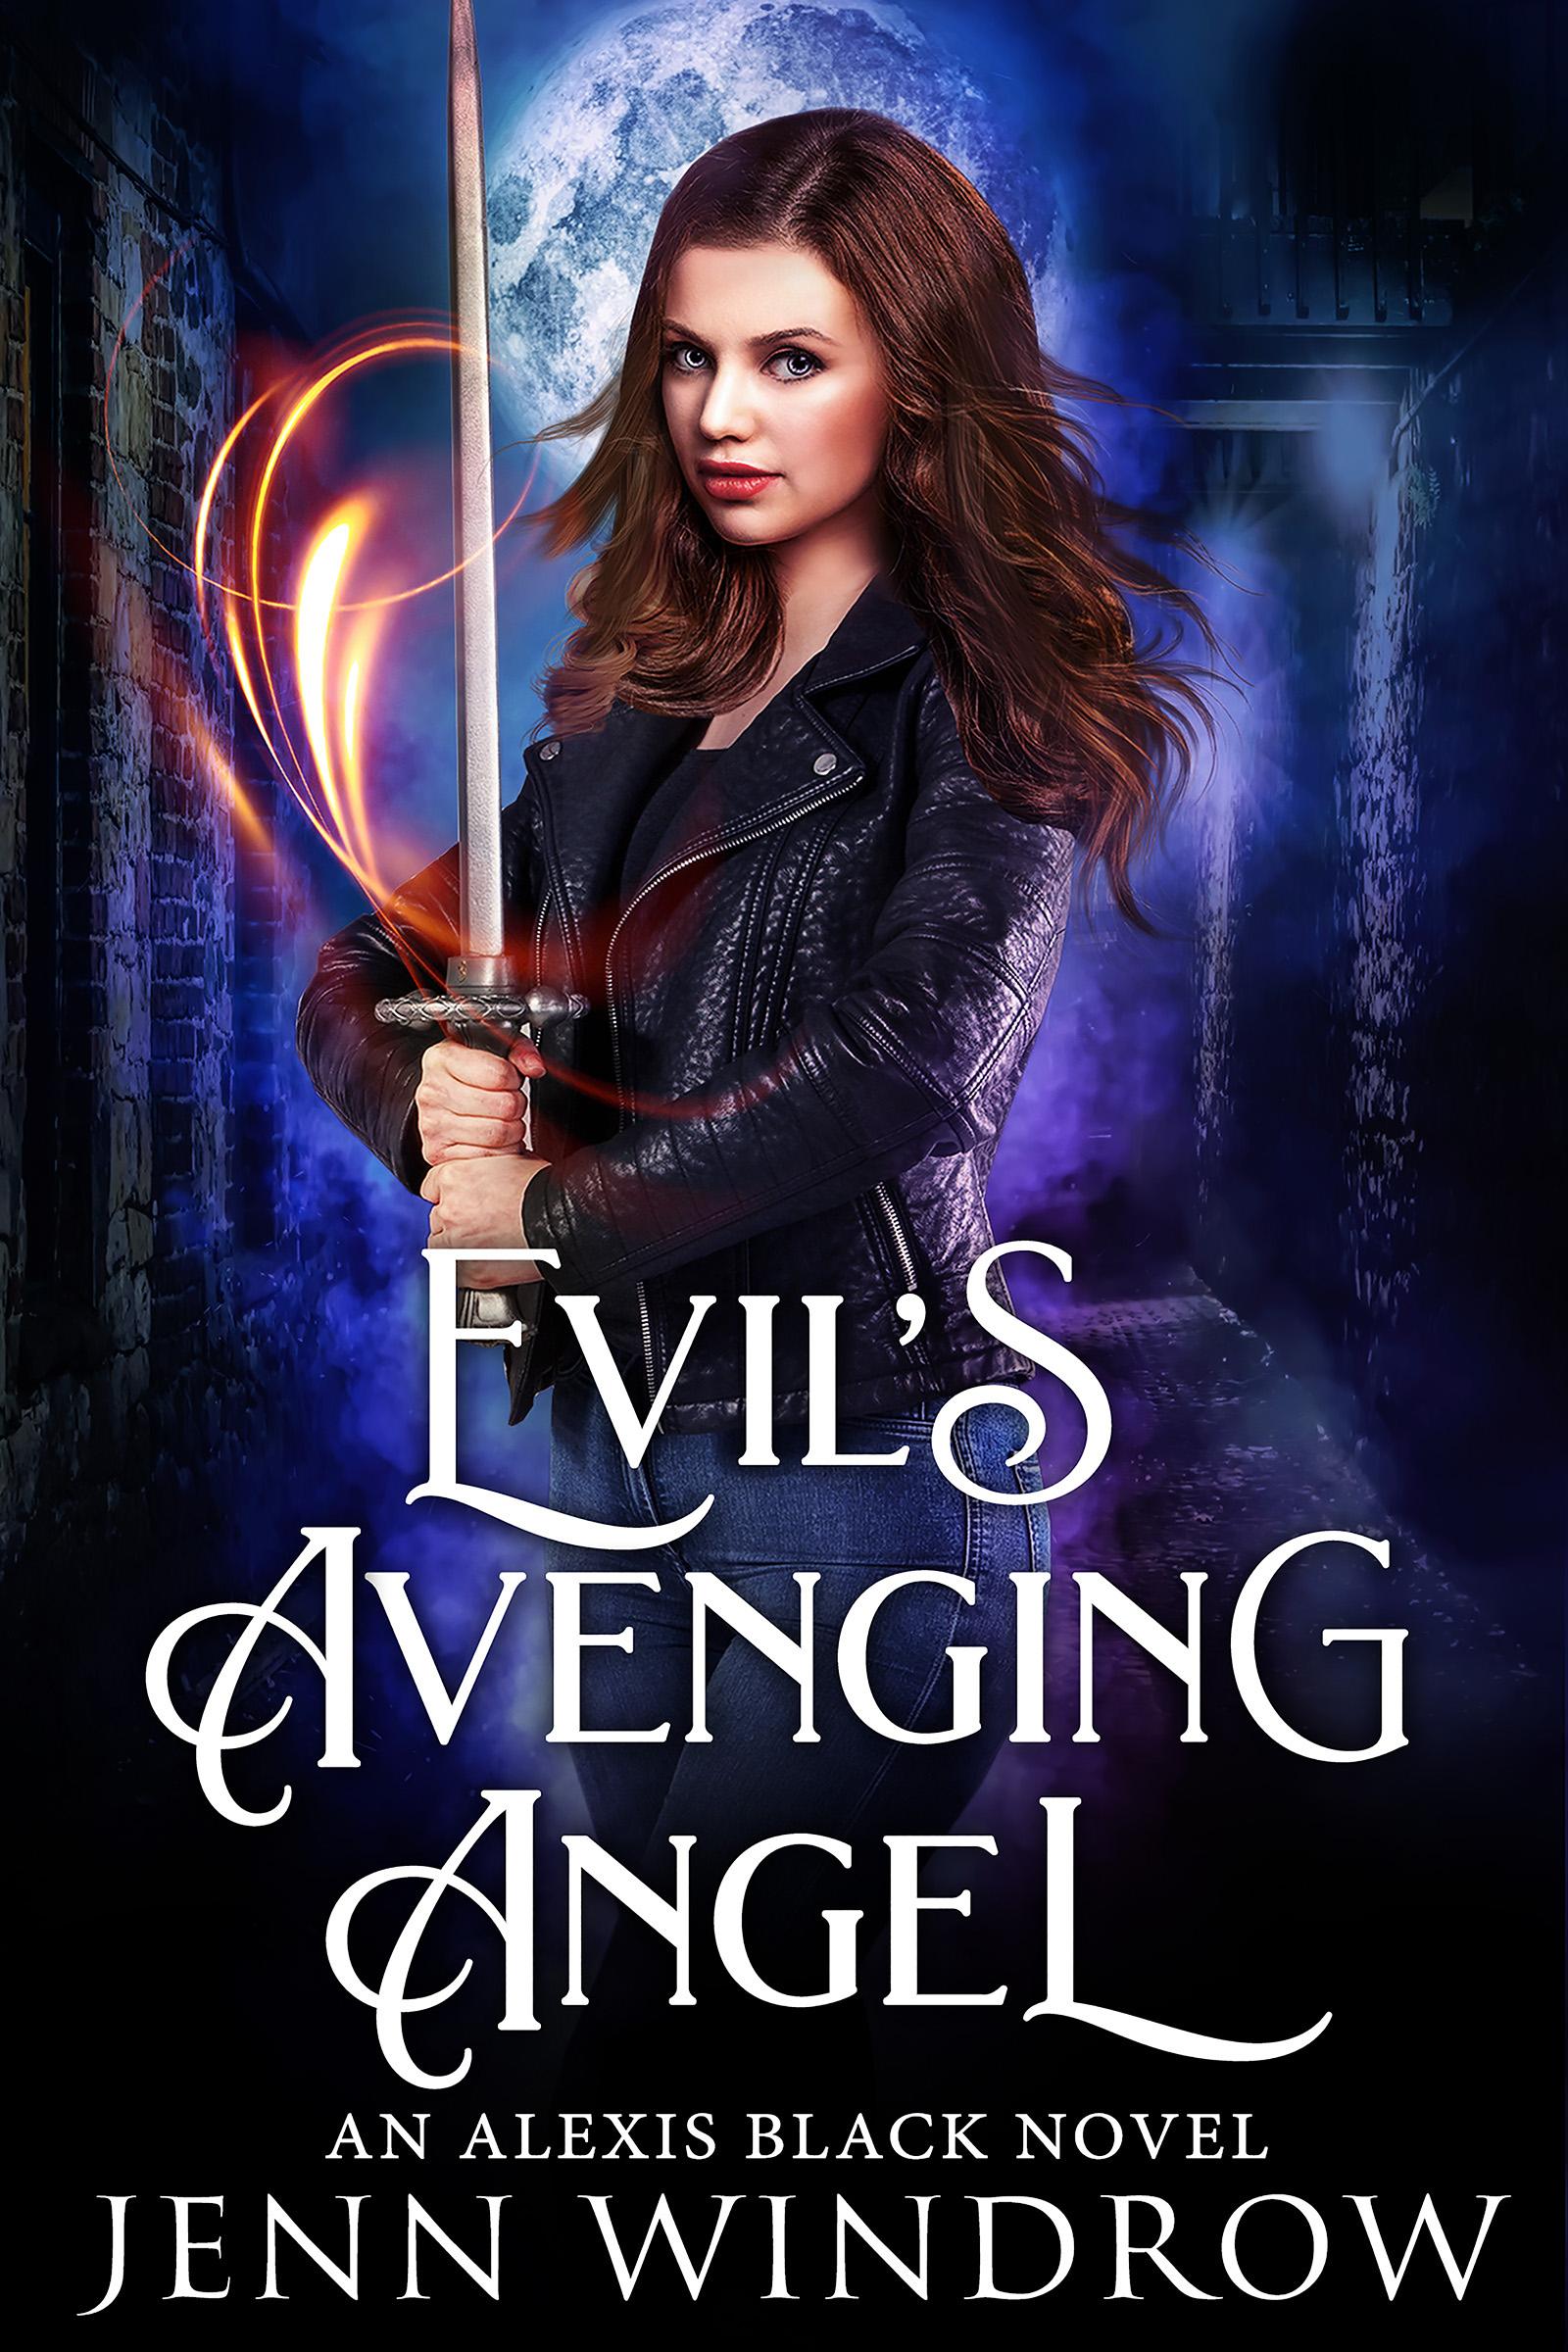 Evils Avenging Angel cover